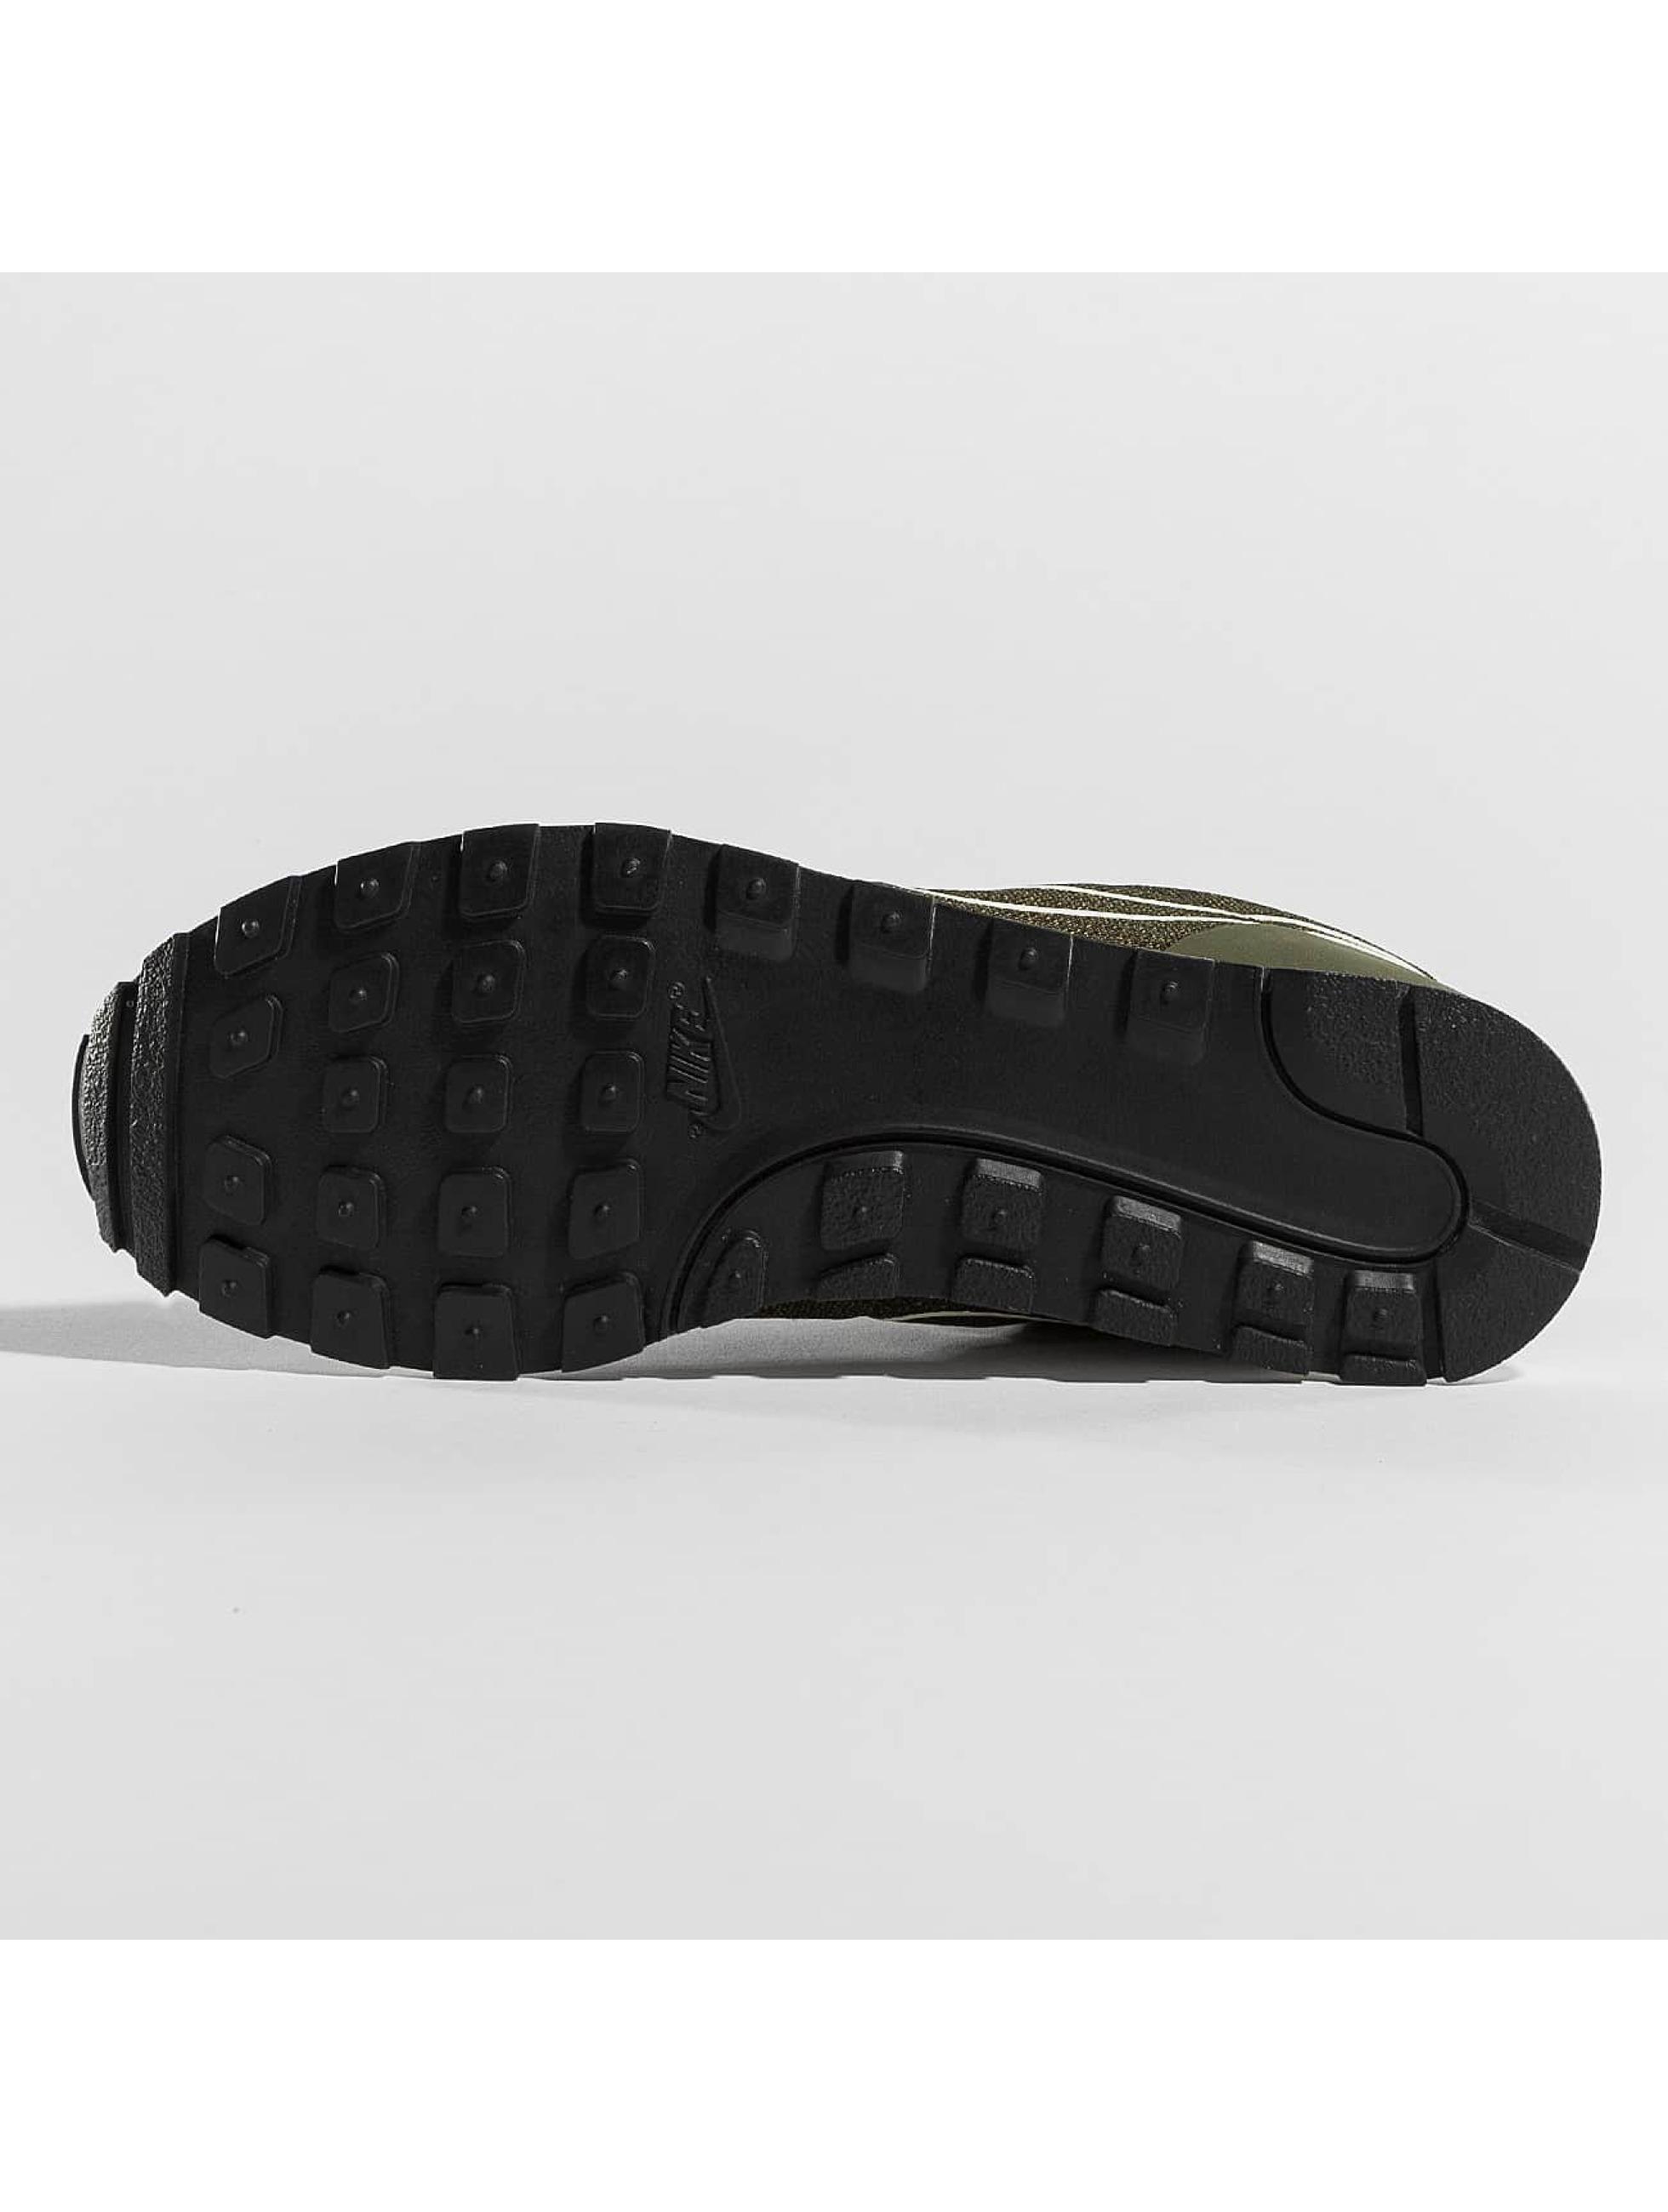 Nike Sneakers MD Runner II ENG Mesh khaki